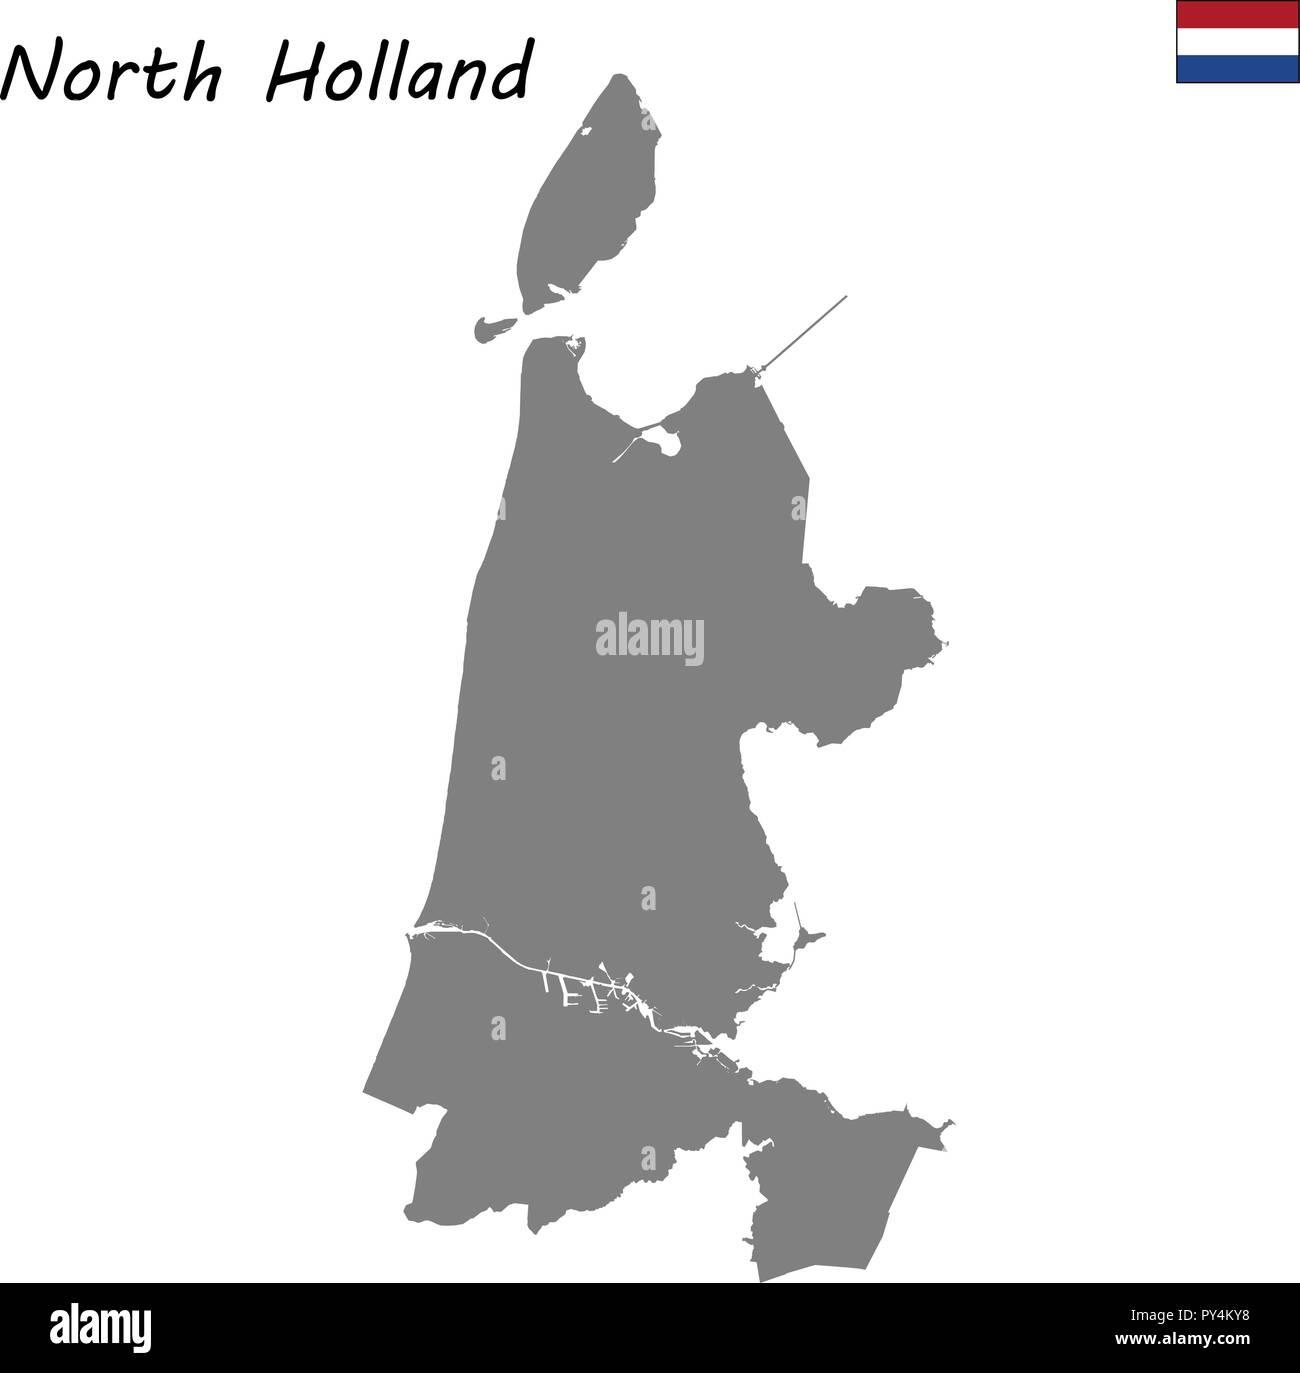 Niederlande Karte Umriss.Hohe Qualität Karte Provinz Der Niederlande North Holland Vektor